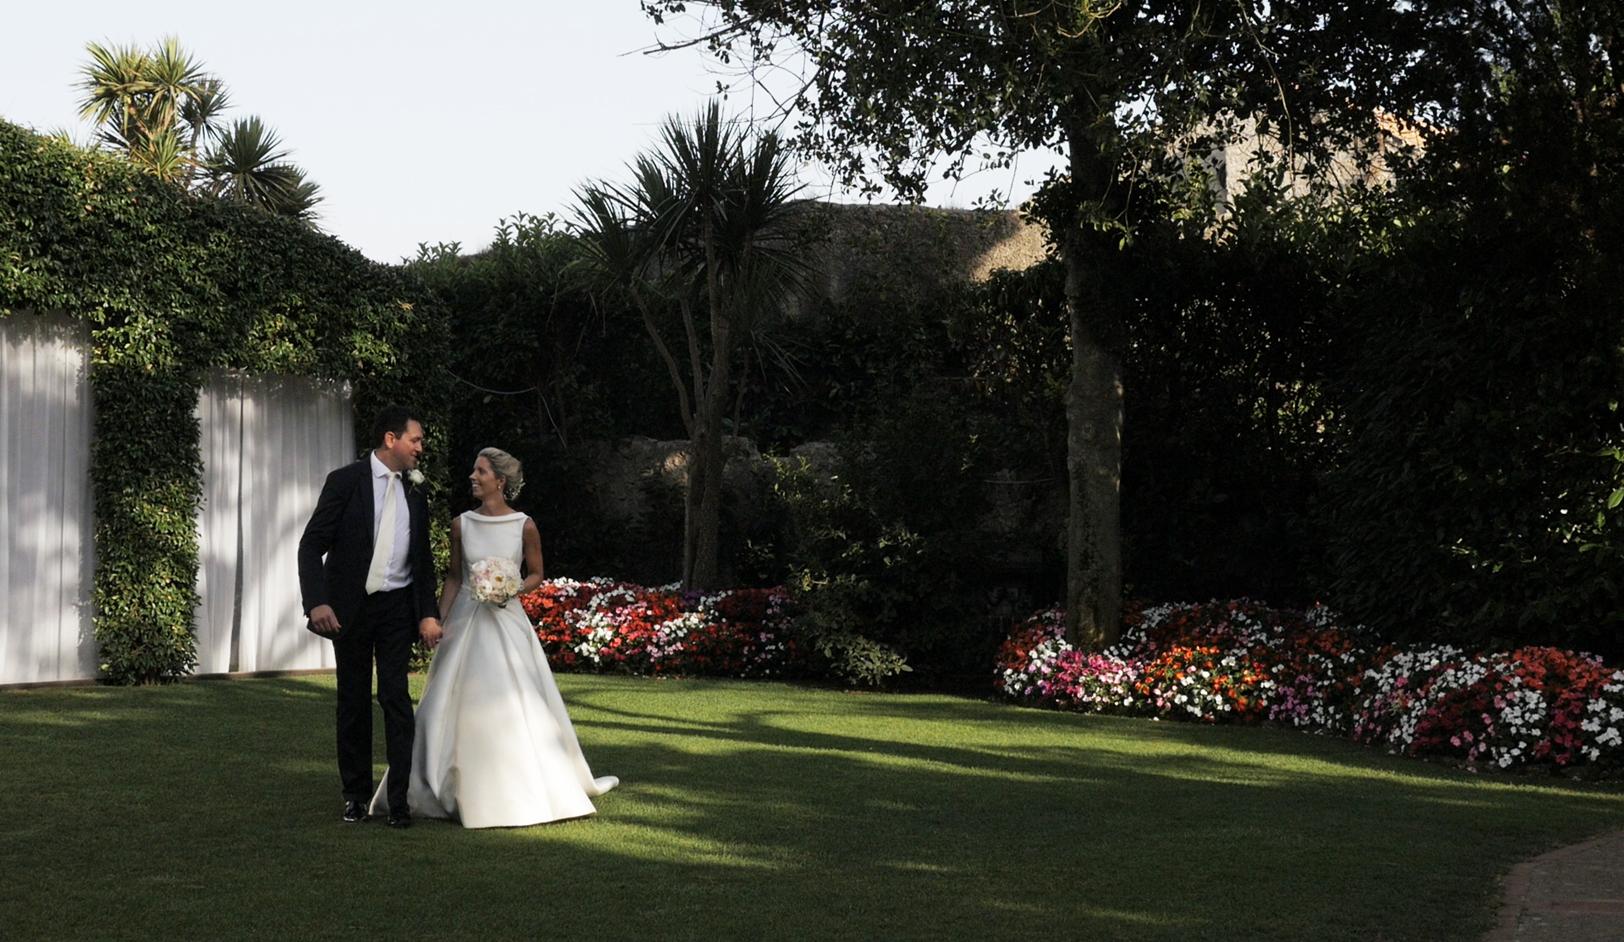 matrimonio-a-villa-eva-villa-cimbrone-ravello-italia.jpg